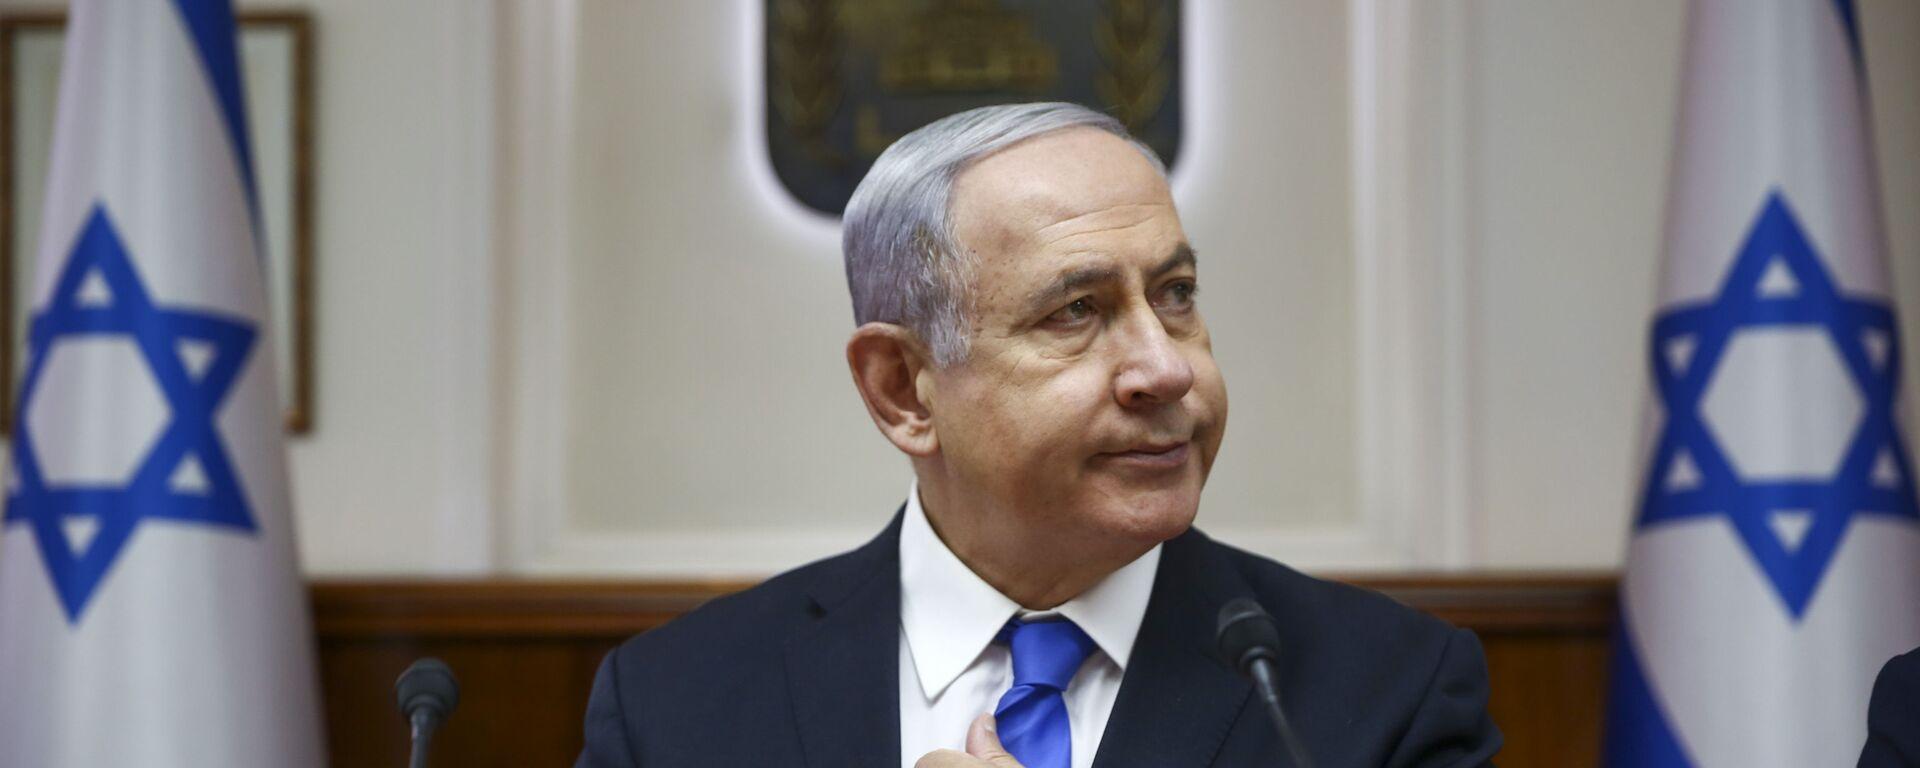 El primer ministro israelí, Benjamín Netanyahu - Sputnik Mundo, 1920, 15.11.2020